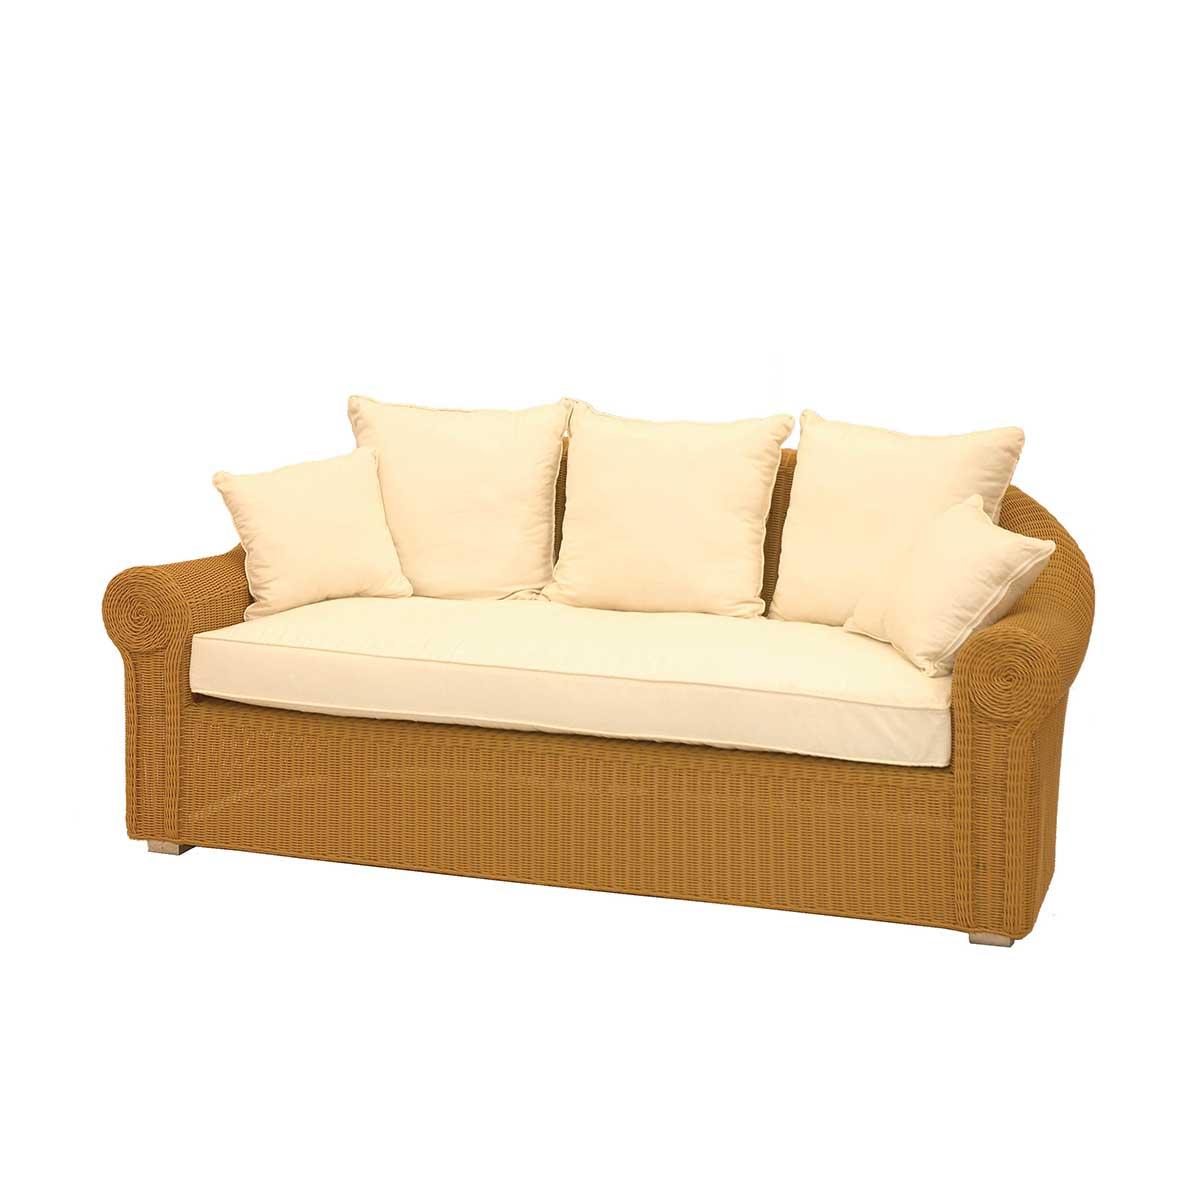 Pleasing Sofa Sets Braided Golf Garden Cjindustries Chair Design For Home Cjindustriesco